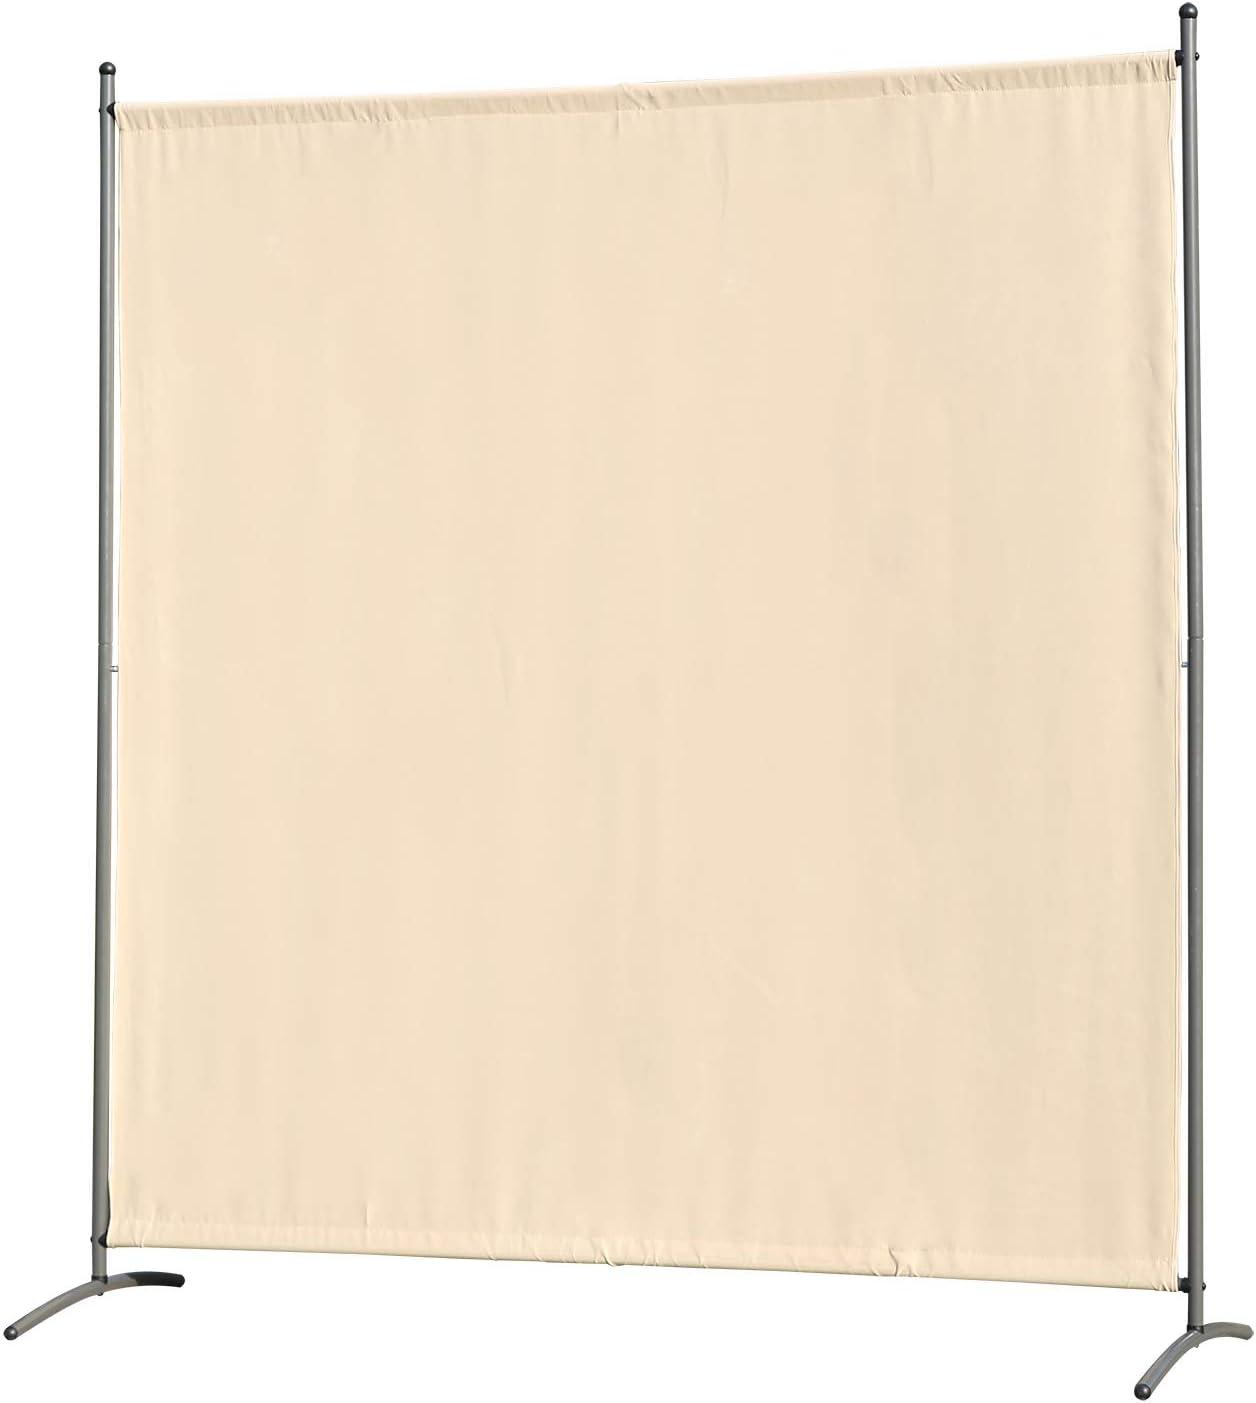 Natural Separador de Ambientes Plegable Decoraci/ón Elegante 200x180 cm Divisor de Habitaciones Angel Living Biombo de Bamb/ú con 4 Paneles